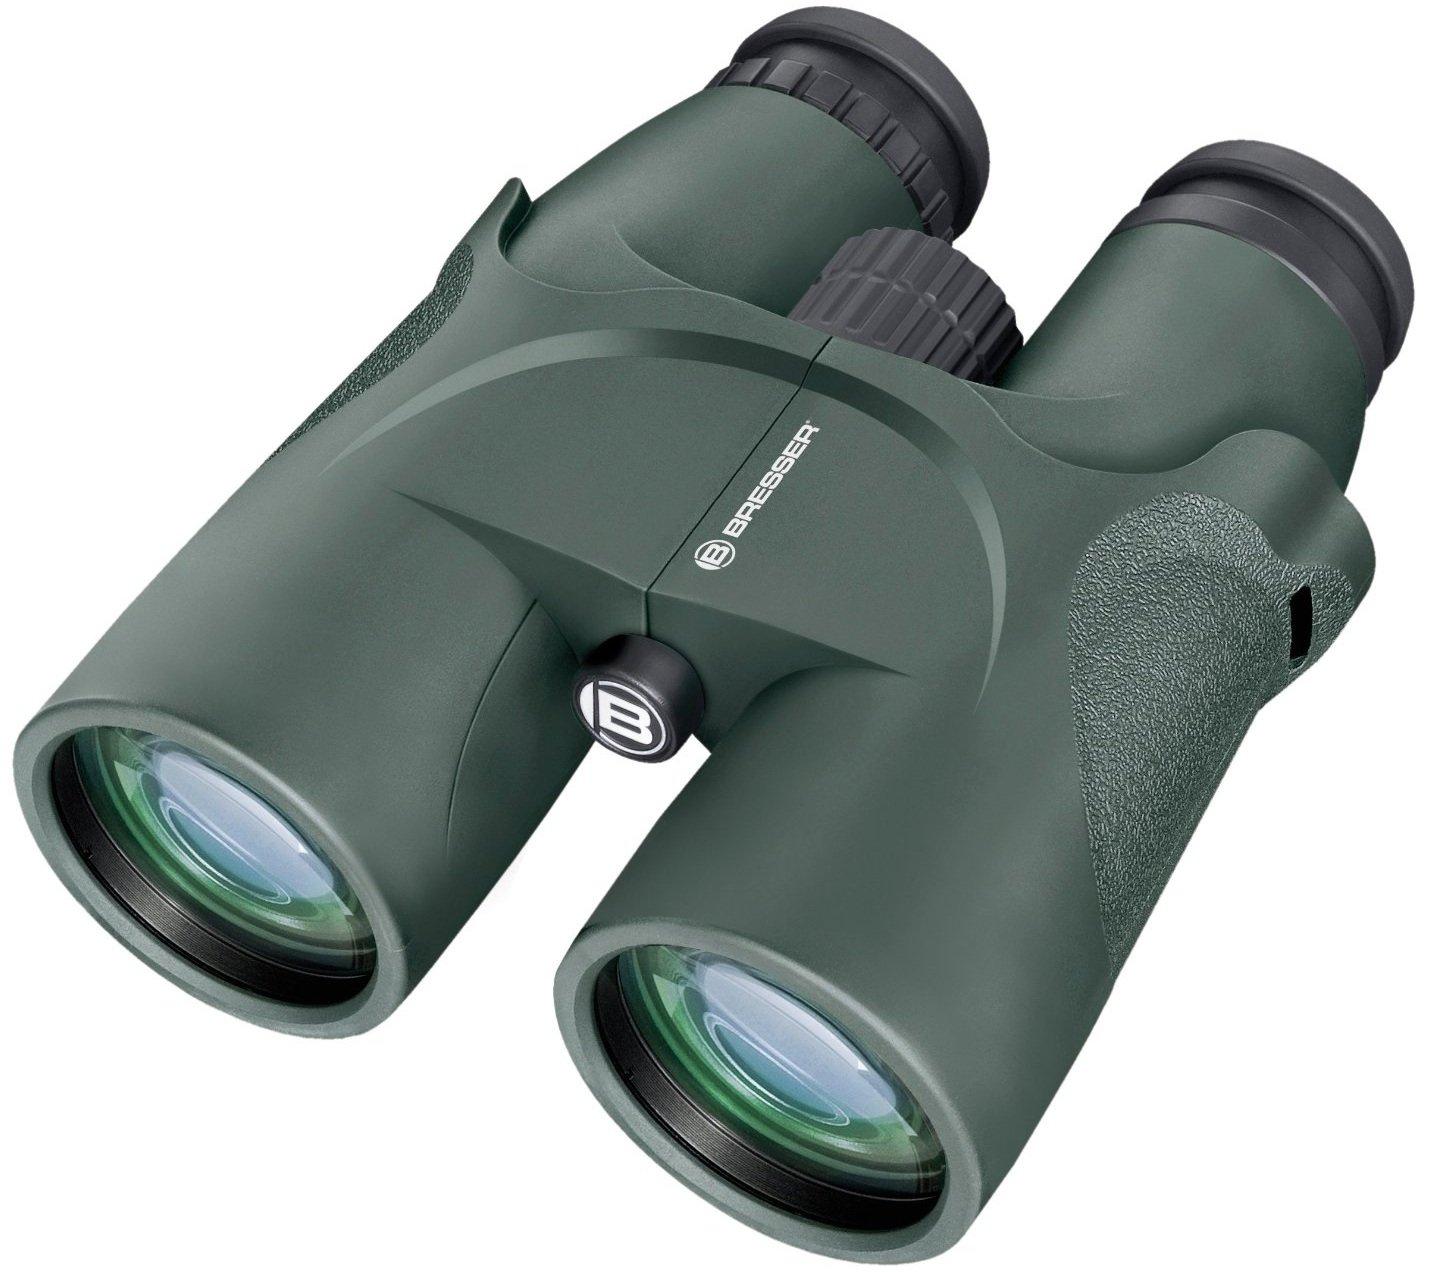 Bresser 8 x 56 mmコンドル双眼鏡 B001USLCI0